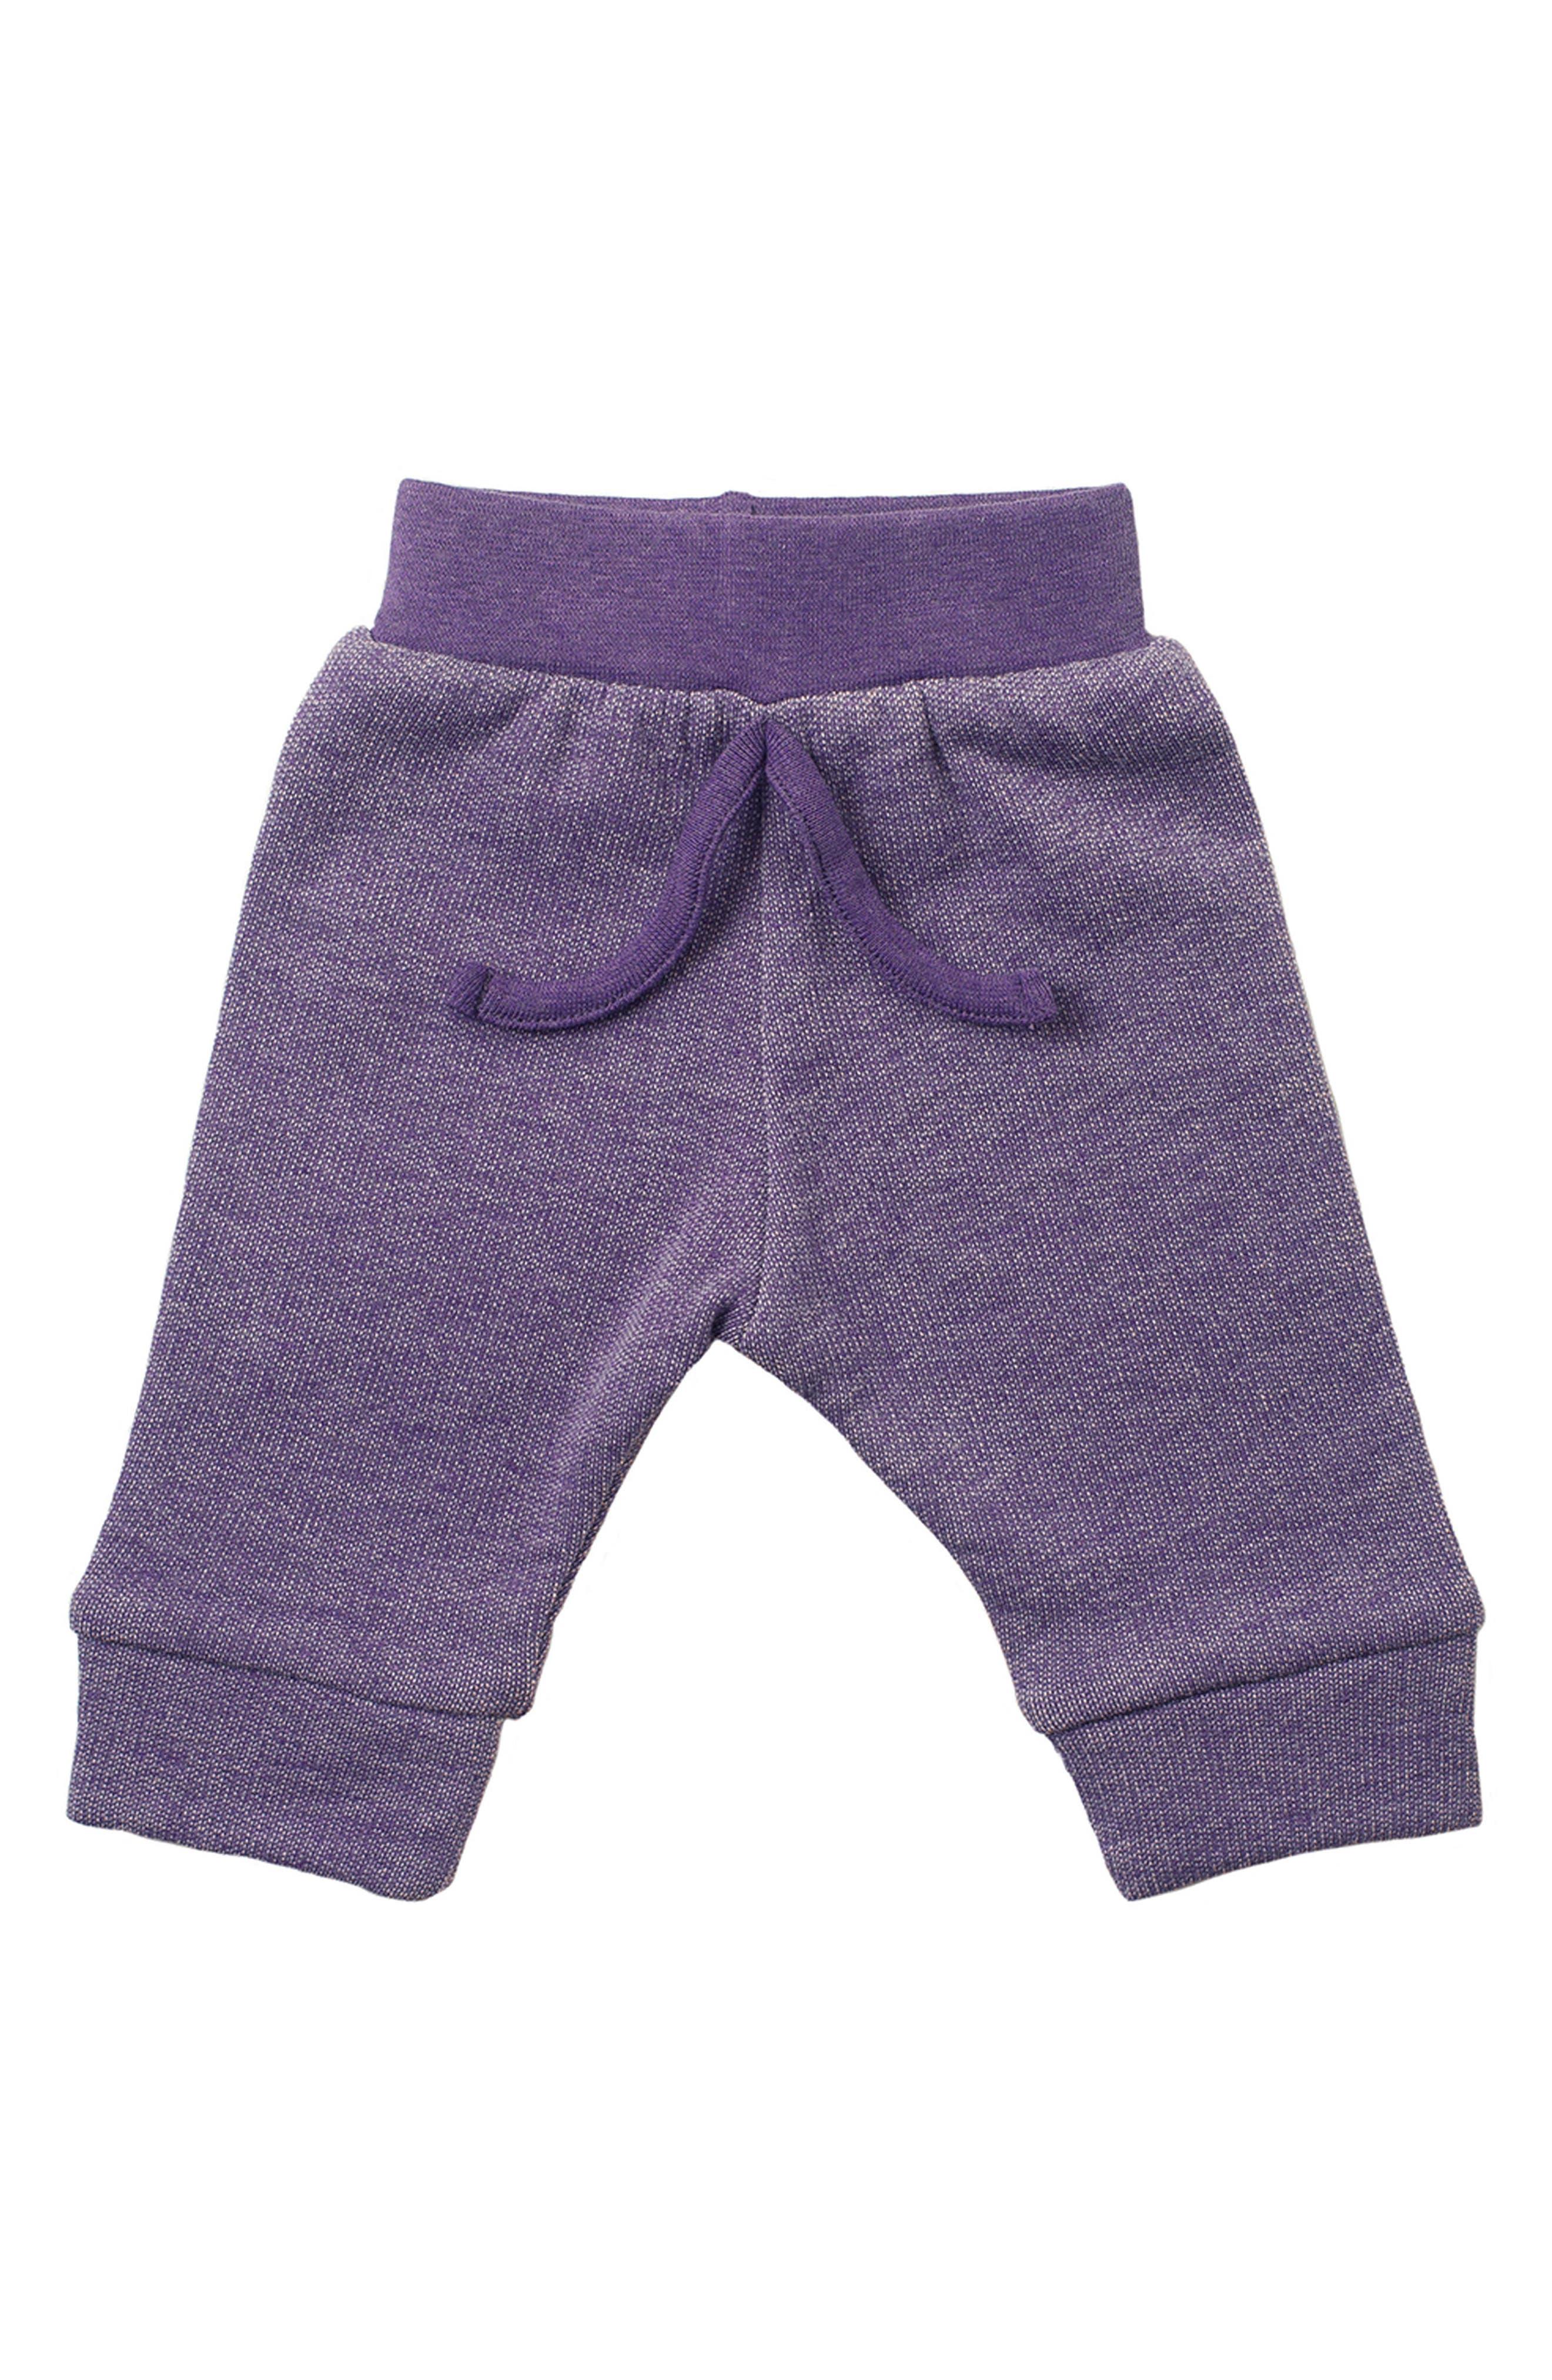 Monica + Andy Organic Cotton Sweatpants (Baby Girls)